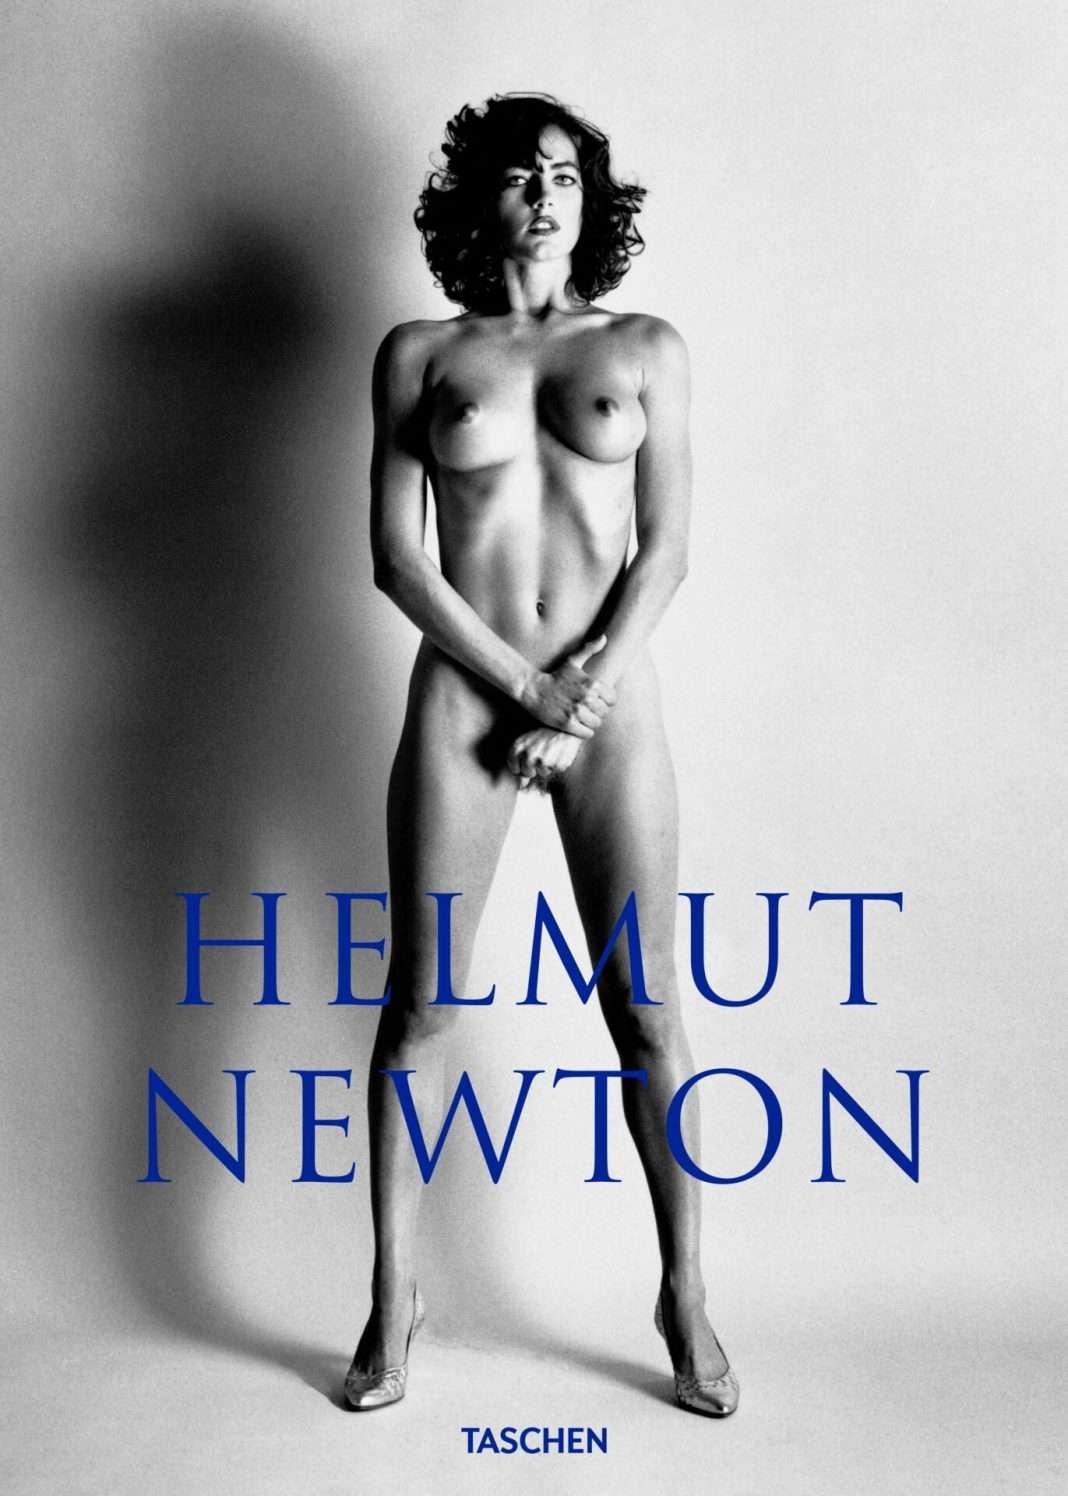 xl newton sumo booklet